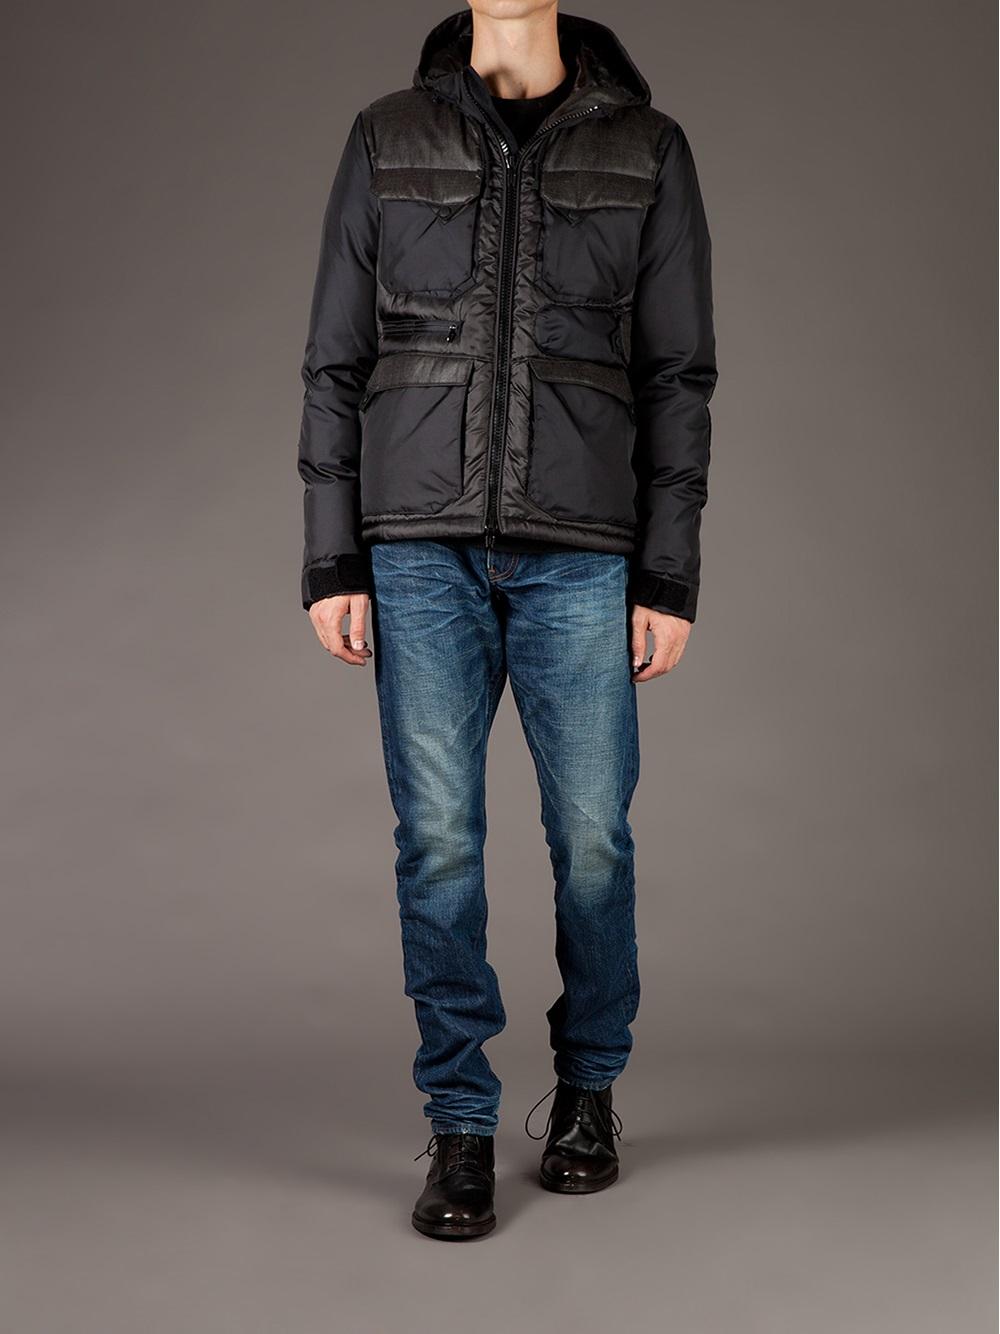 Lyst Moncler Folgore Padded Jacket In Black For Men